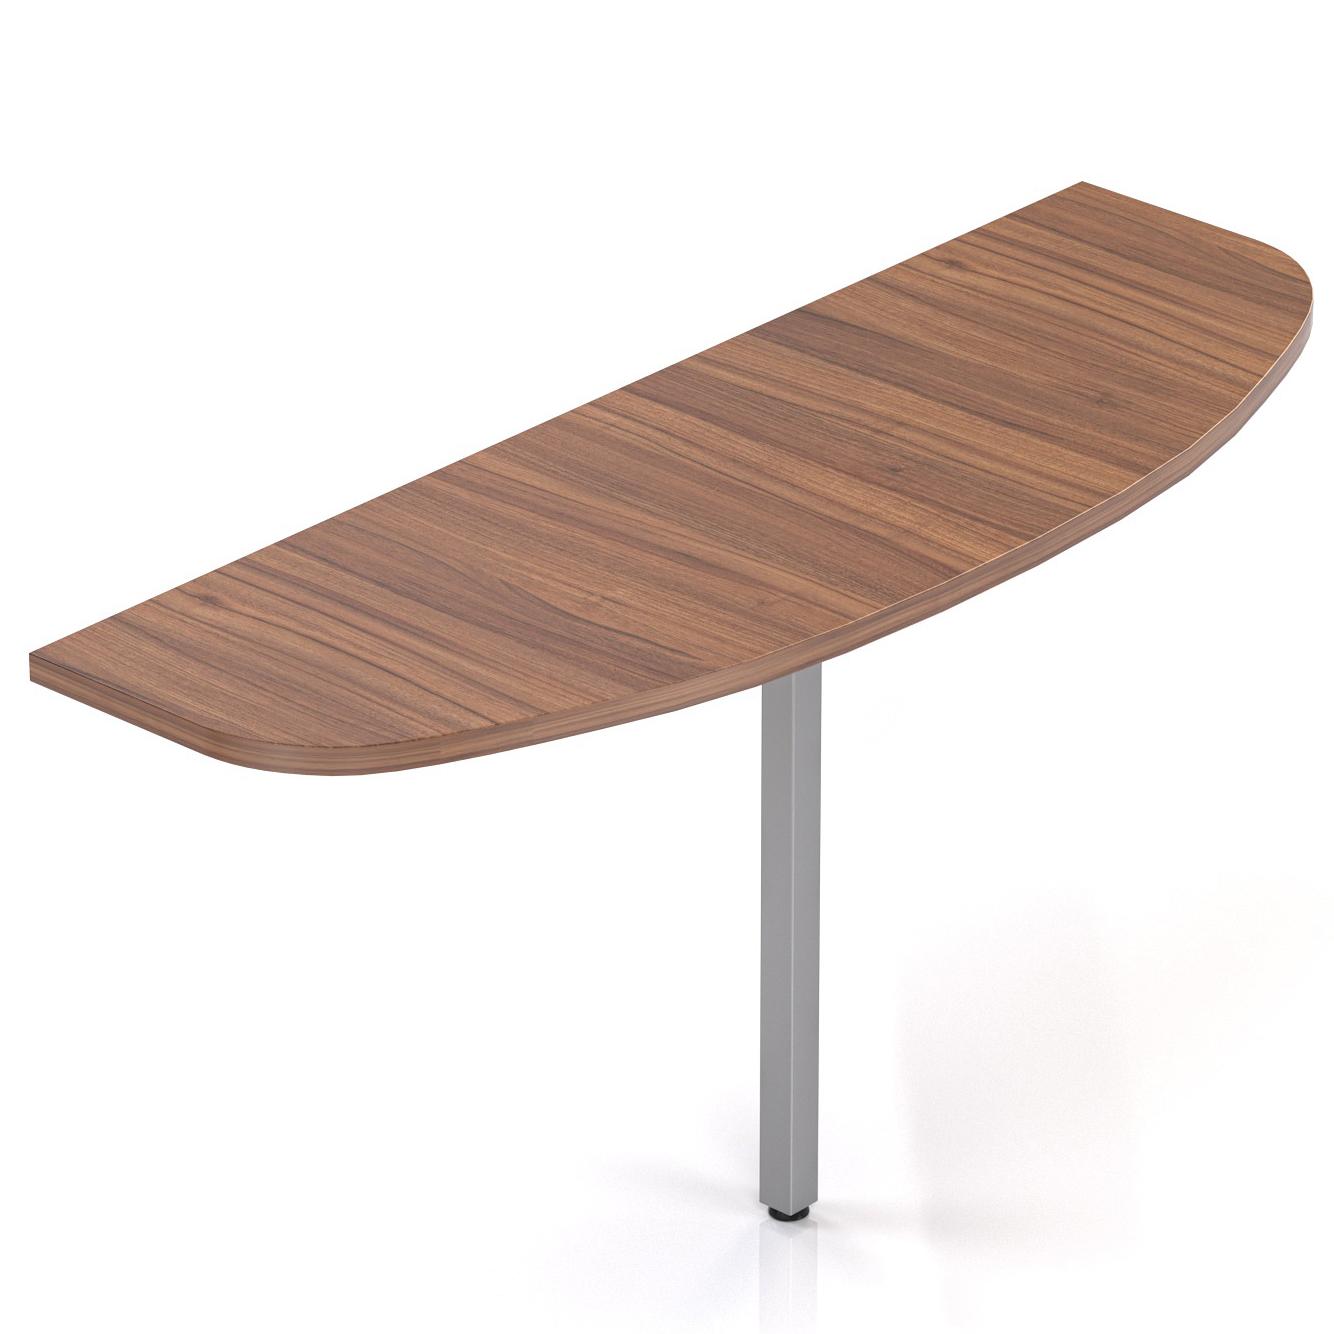 Prístavný stôl Komfort 141,8x50 cm - PR718 19